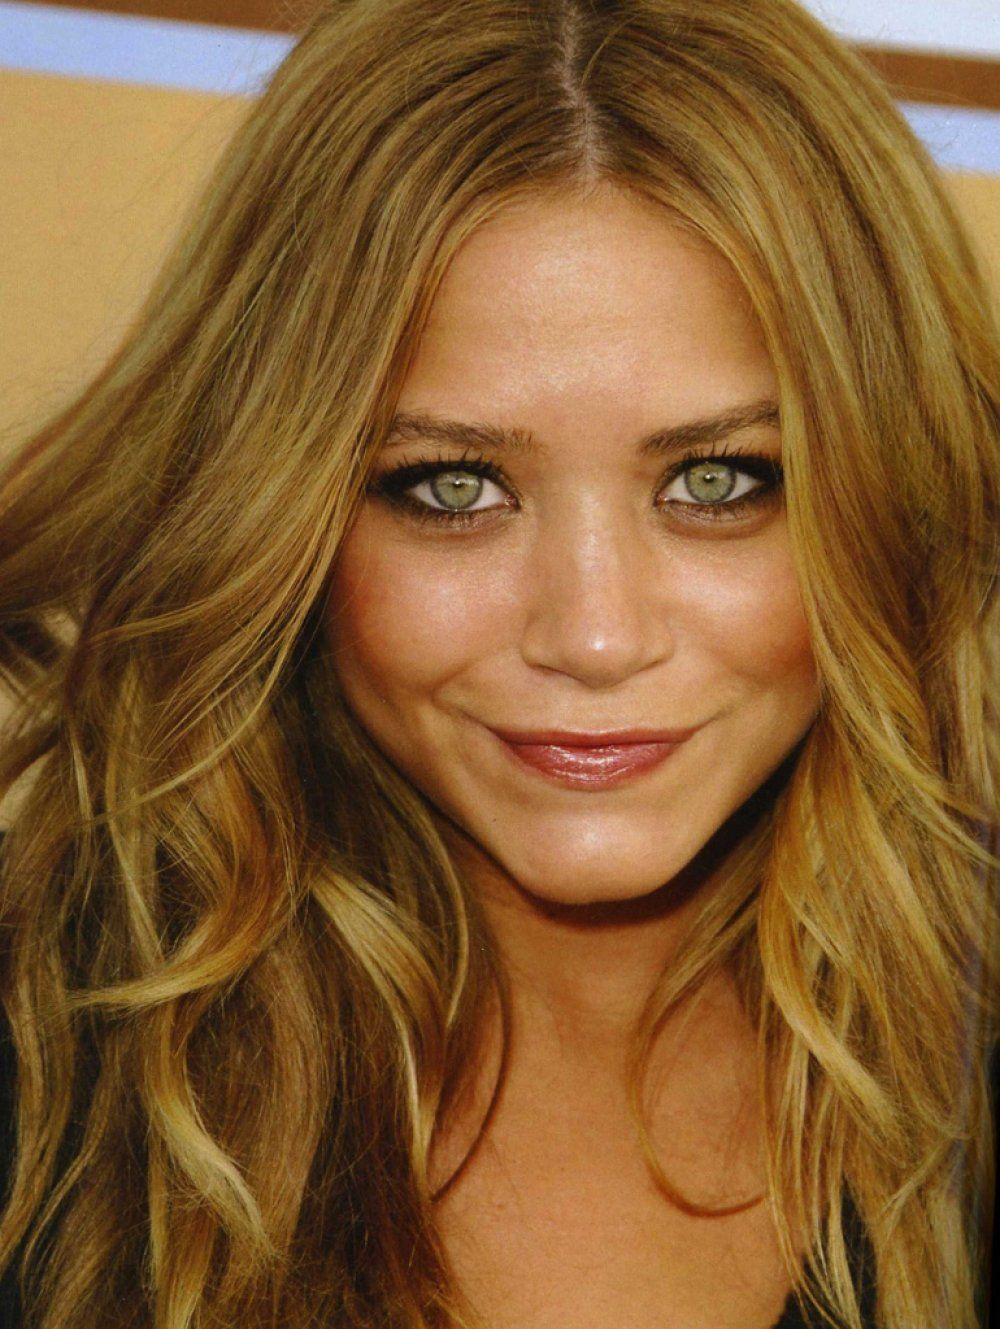 Blonde Hair Color For Green Eyes Blond Hair For Green Eyes